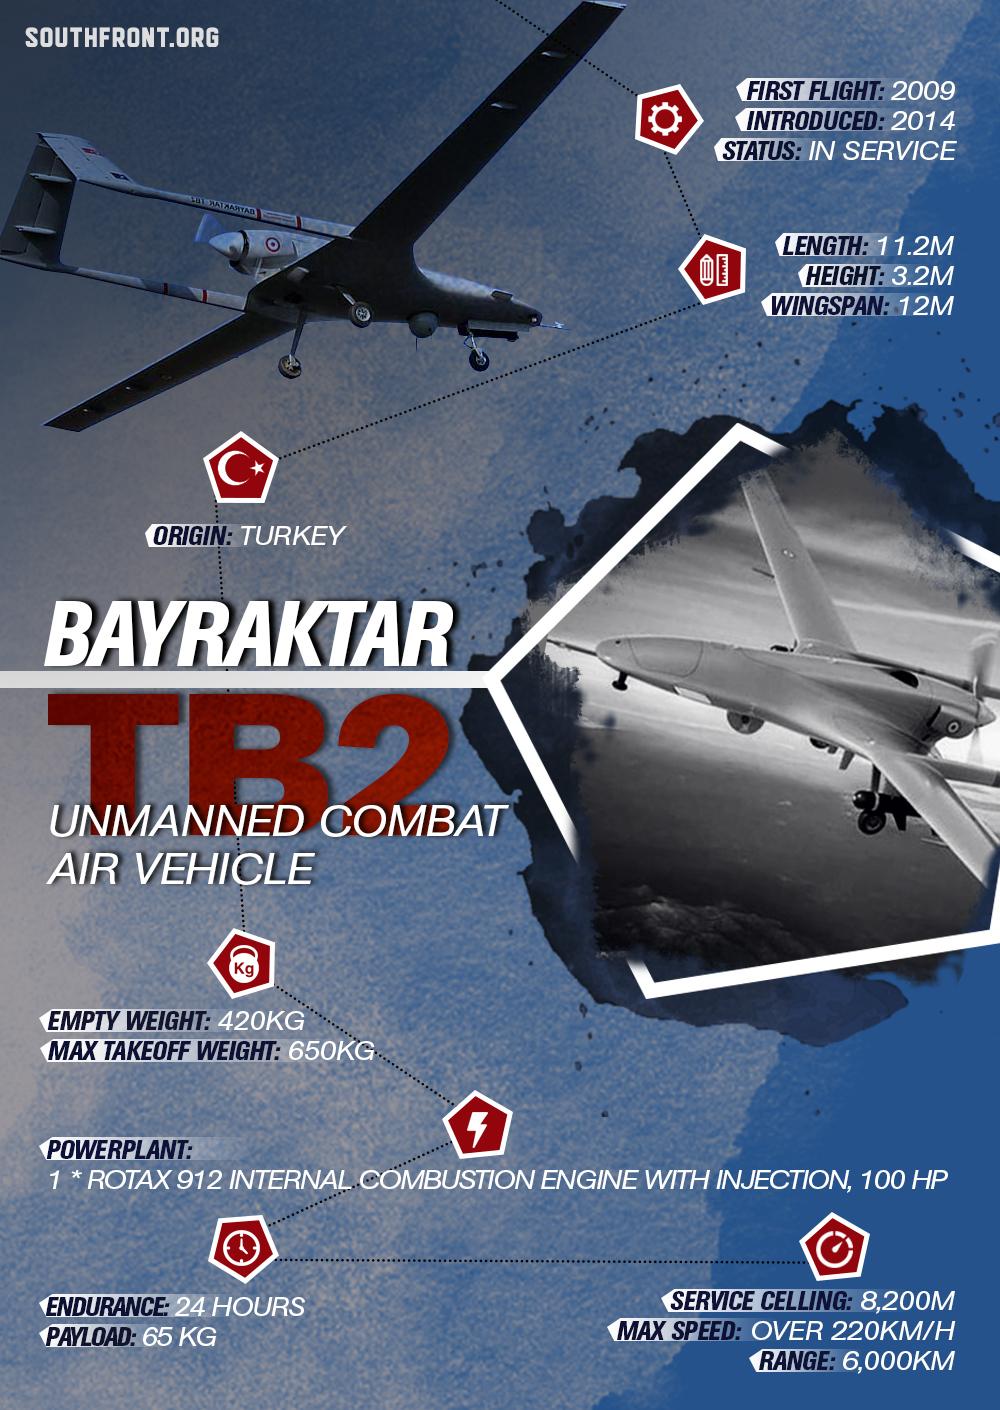 Another Turkish Bayraktar Combat Drone Crashes In Libya (Photos)